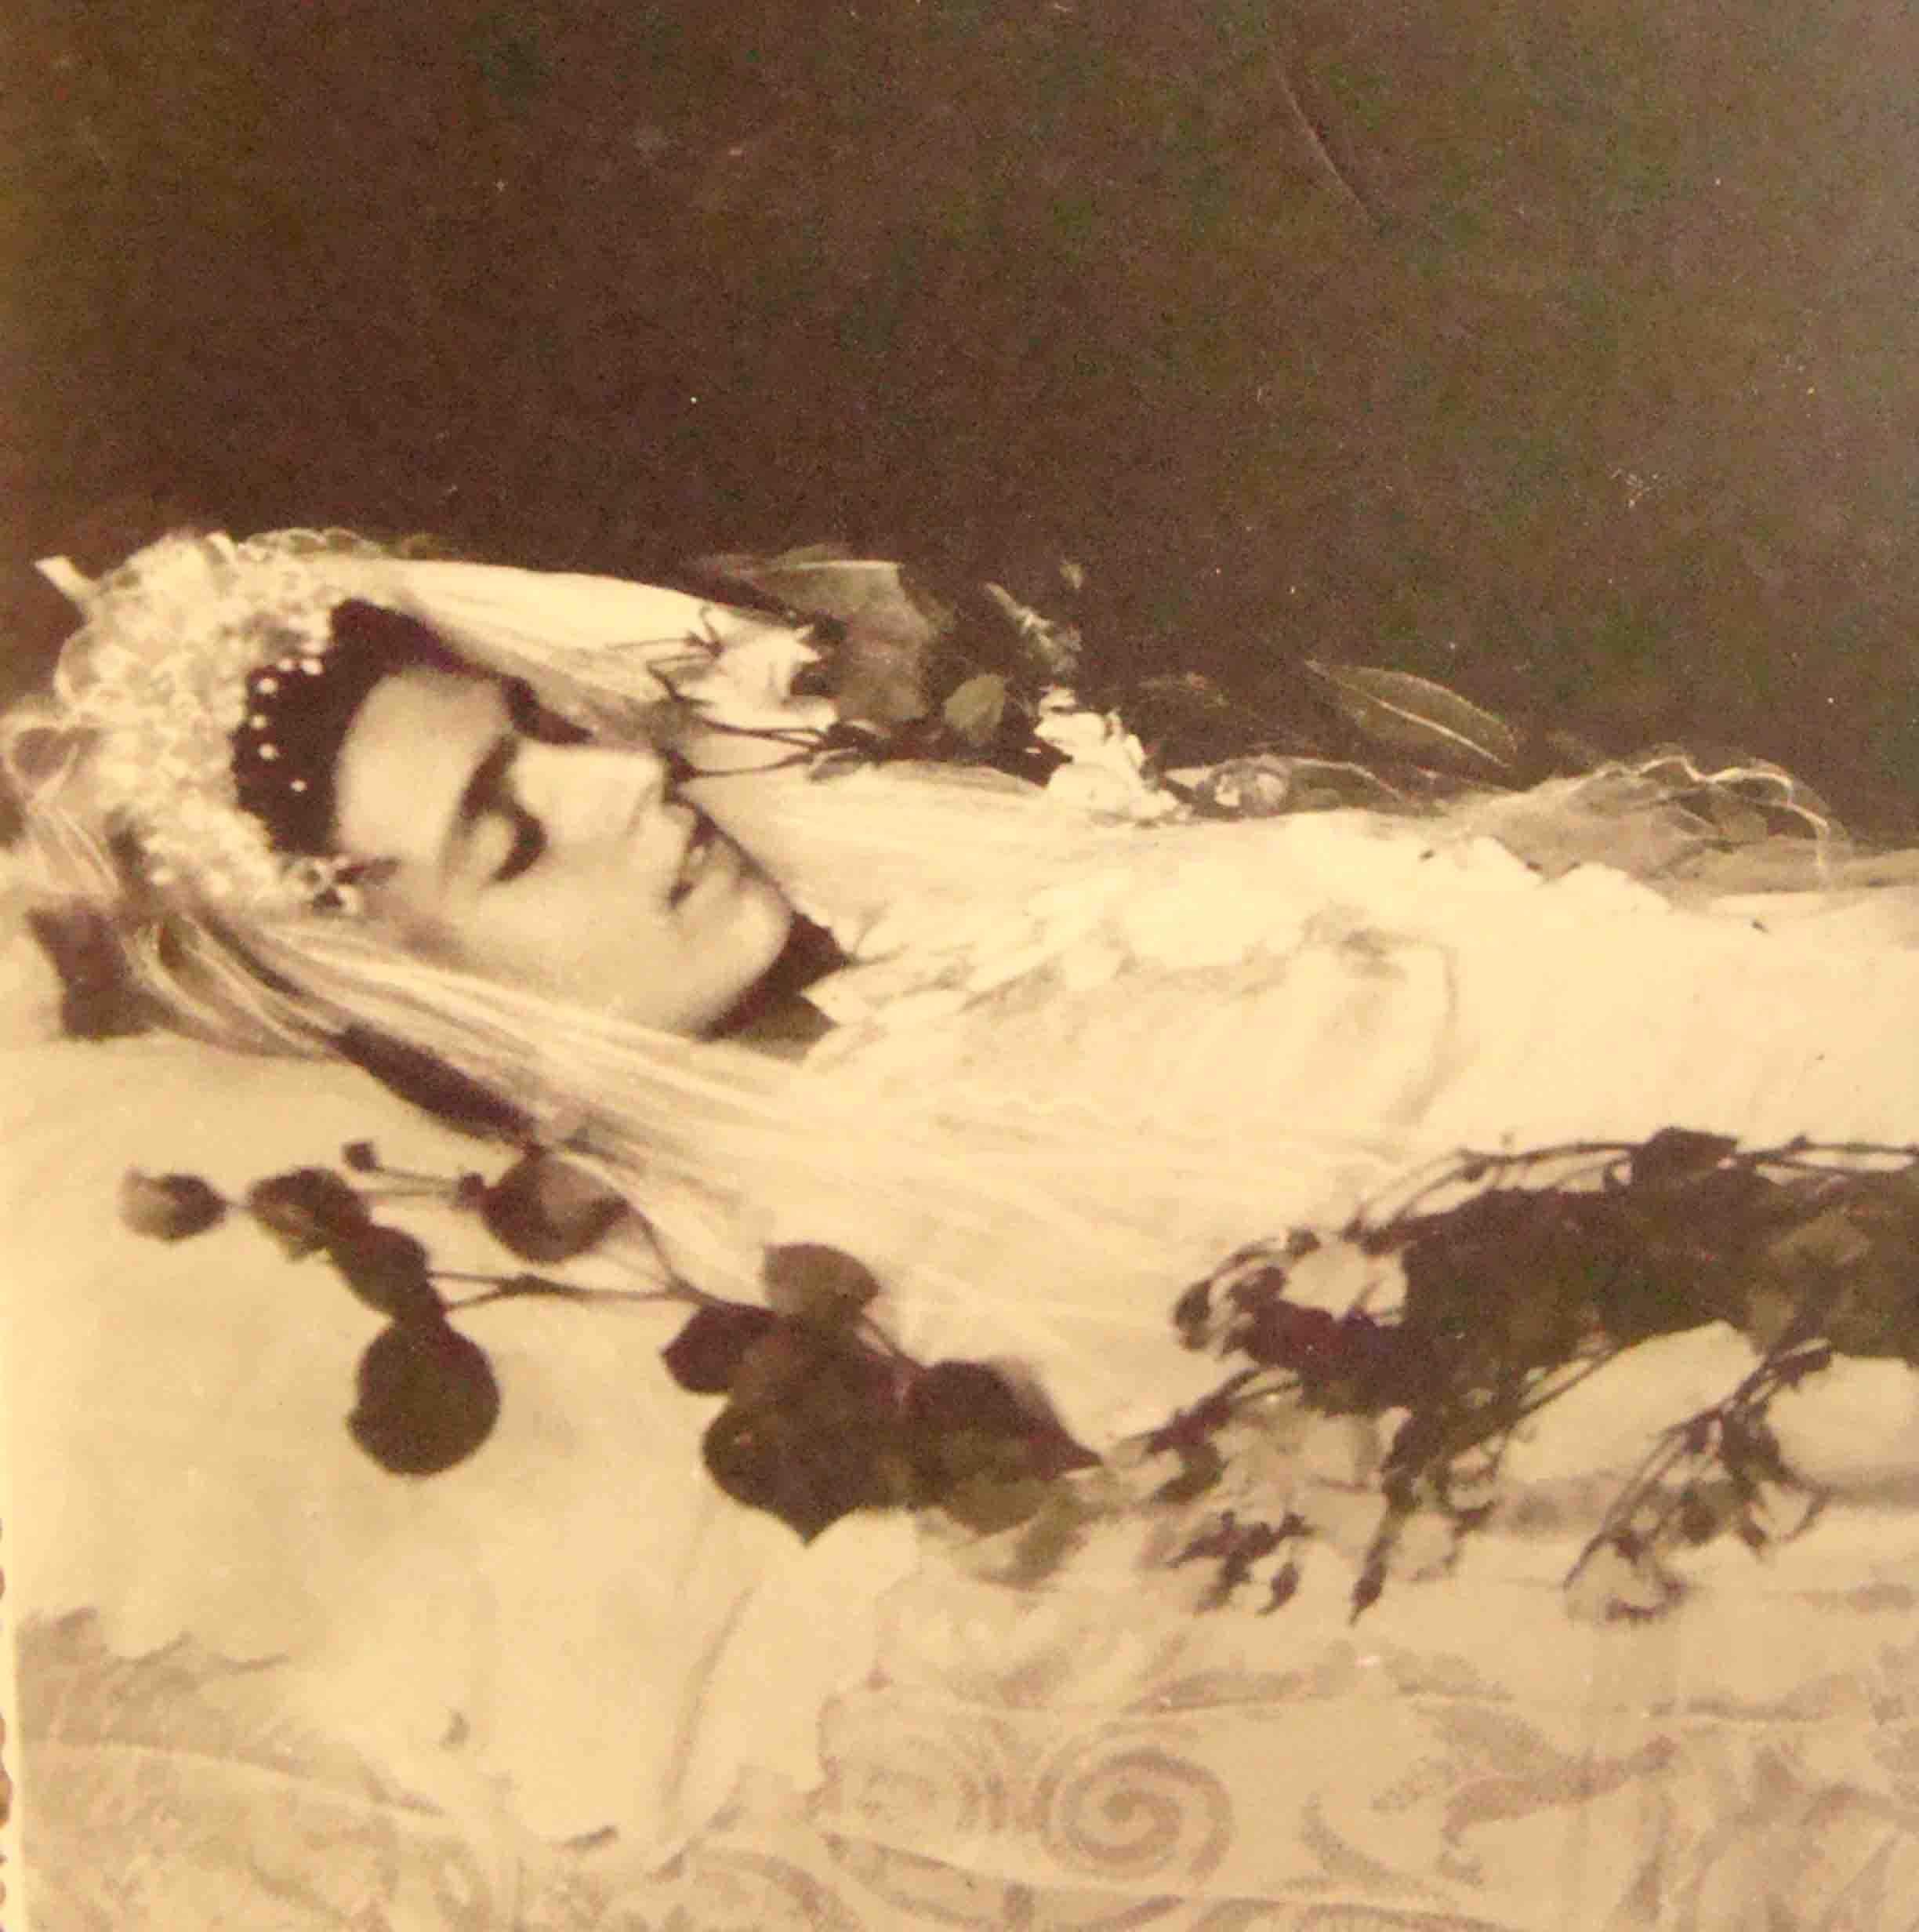 Circa 1920s Most Unusual Beautiful Post Mortem Real Photo Post